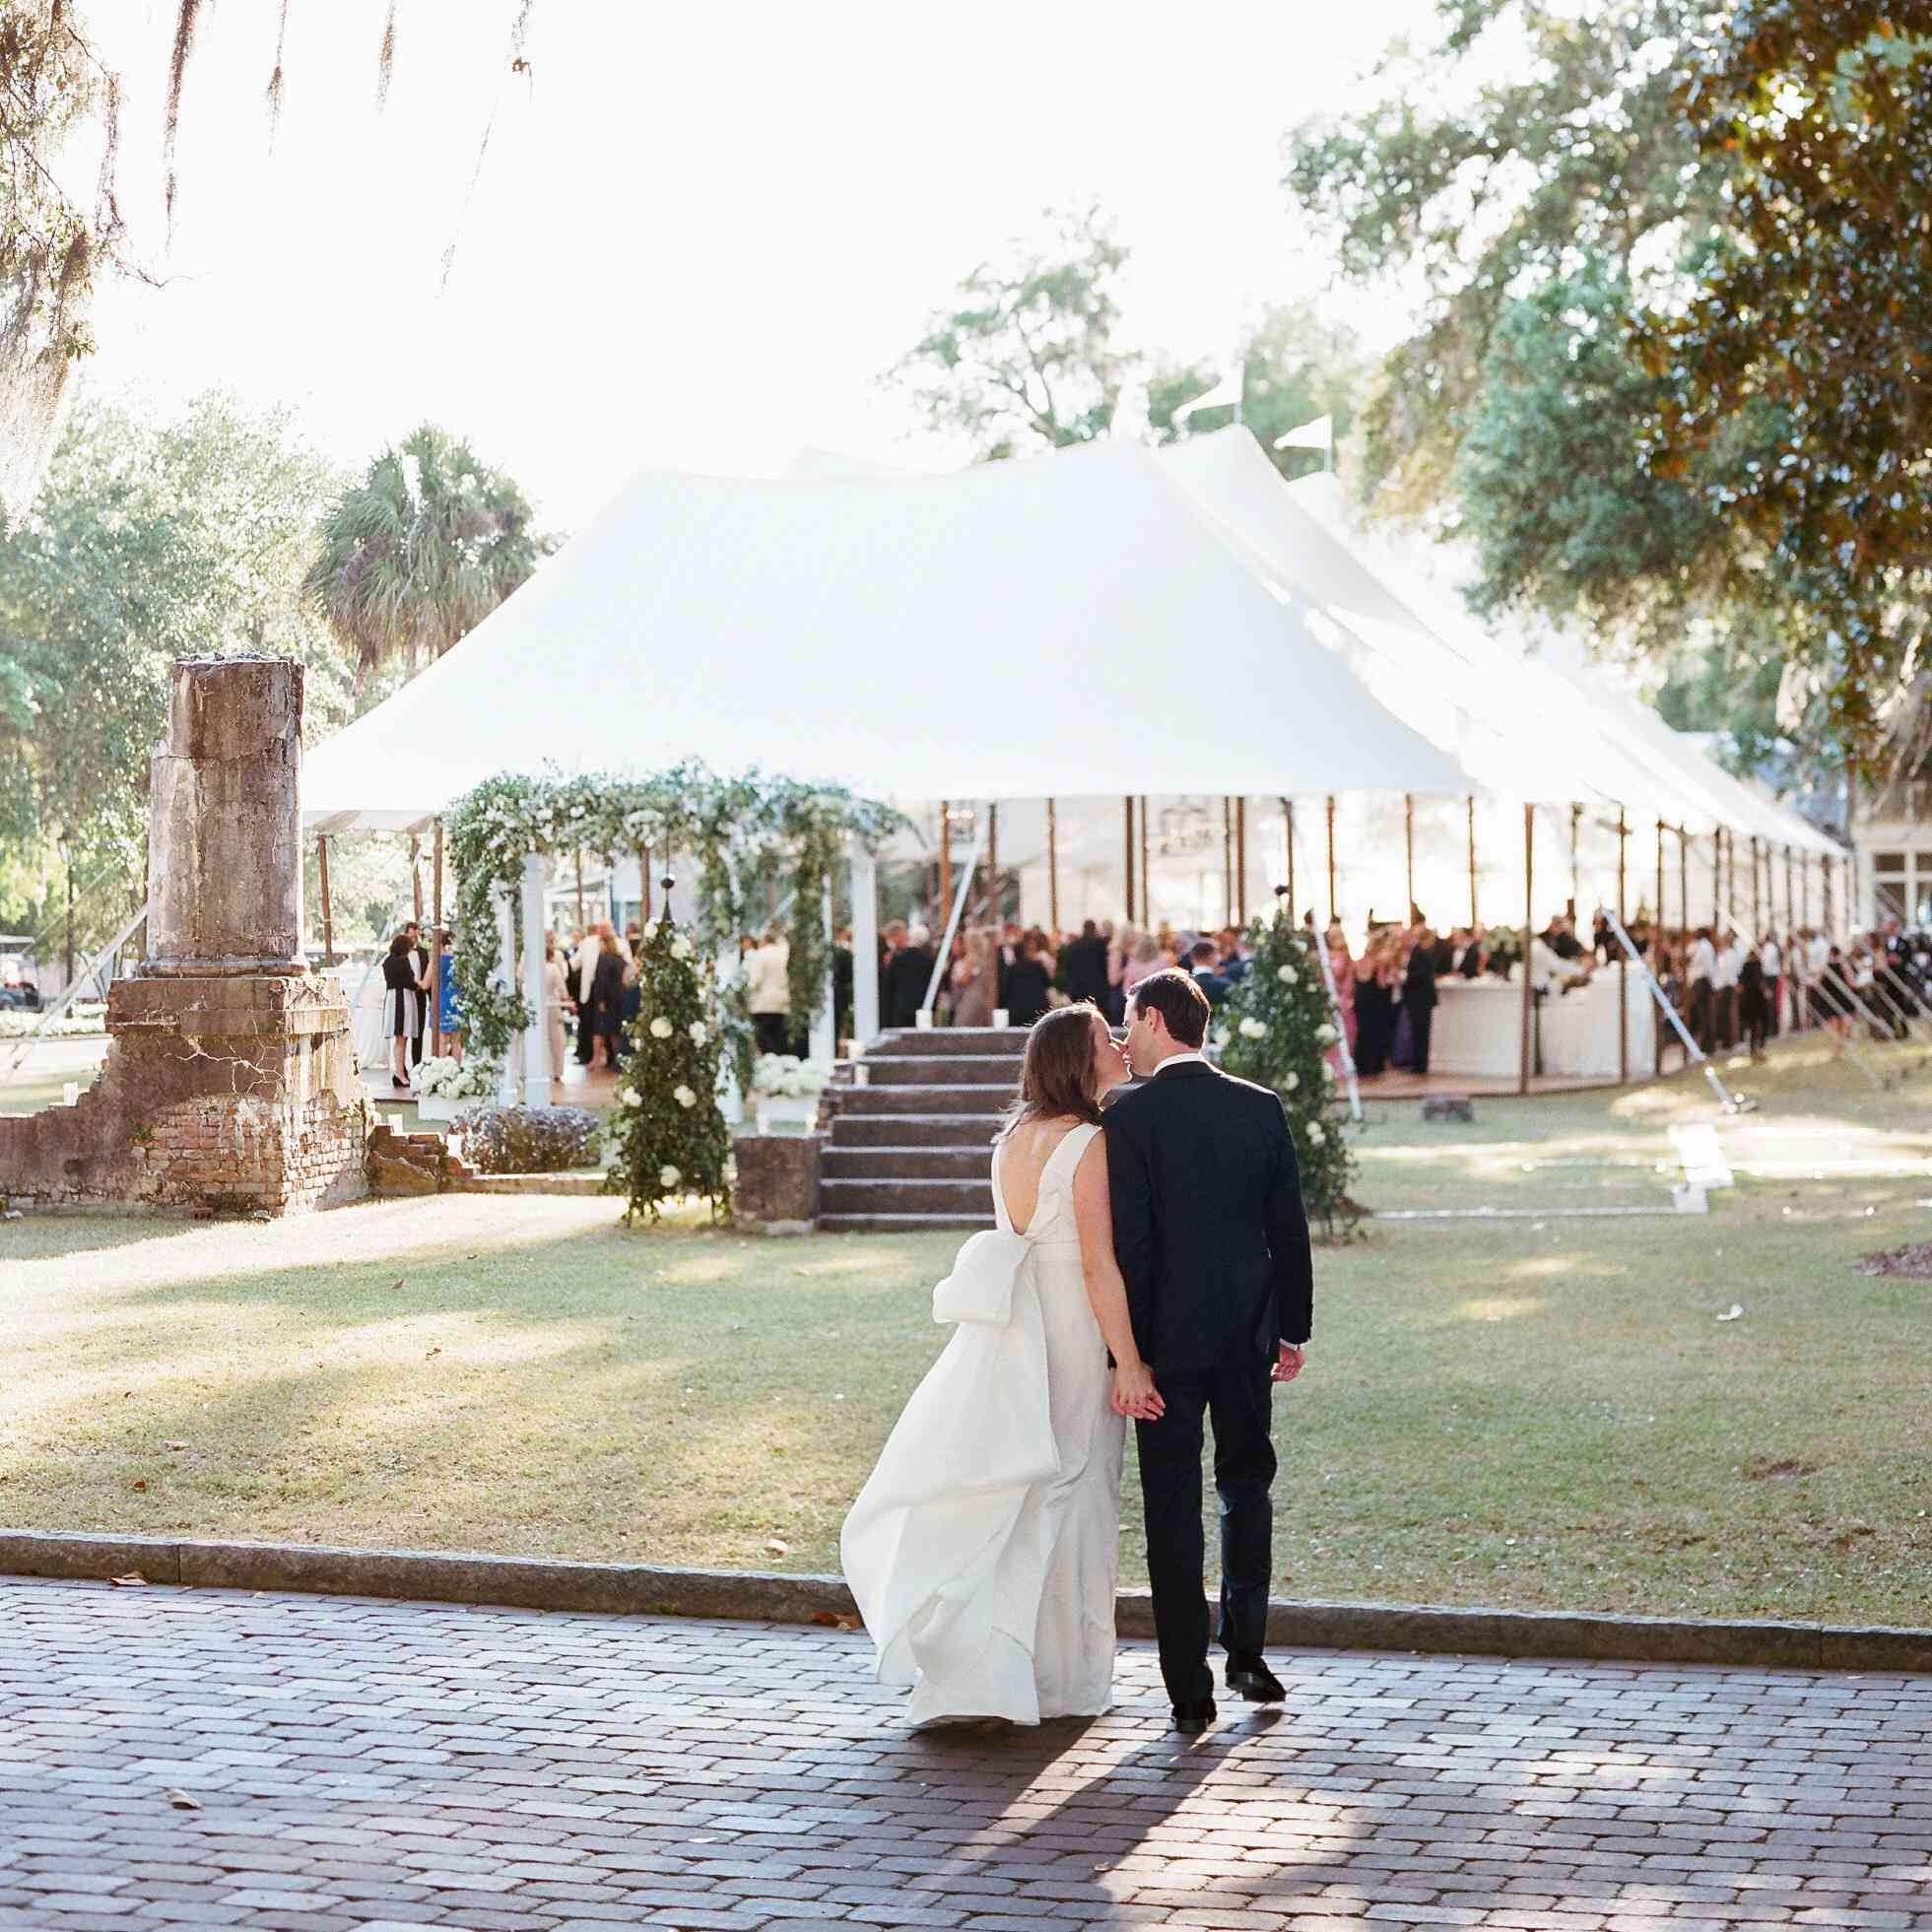 5 Gorgeous Trendy Wedding Themes For 2020: 17 Beautiful Wedding Tent Ideas